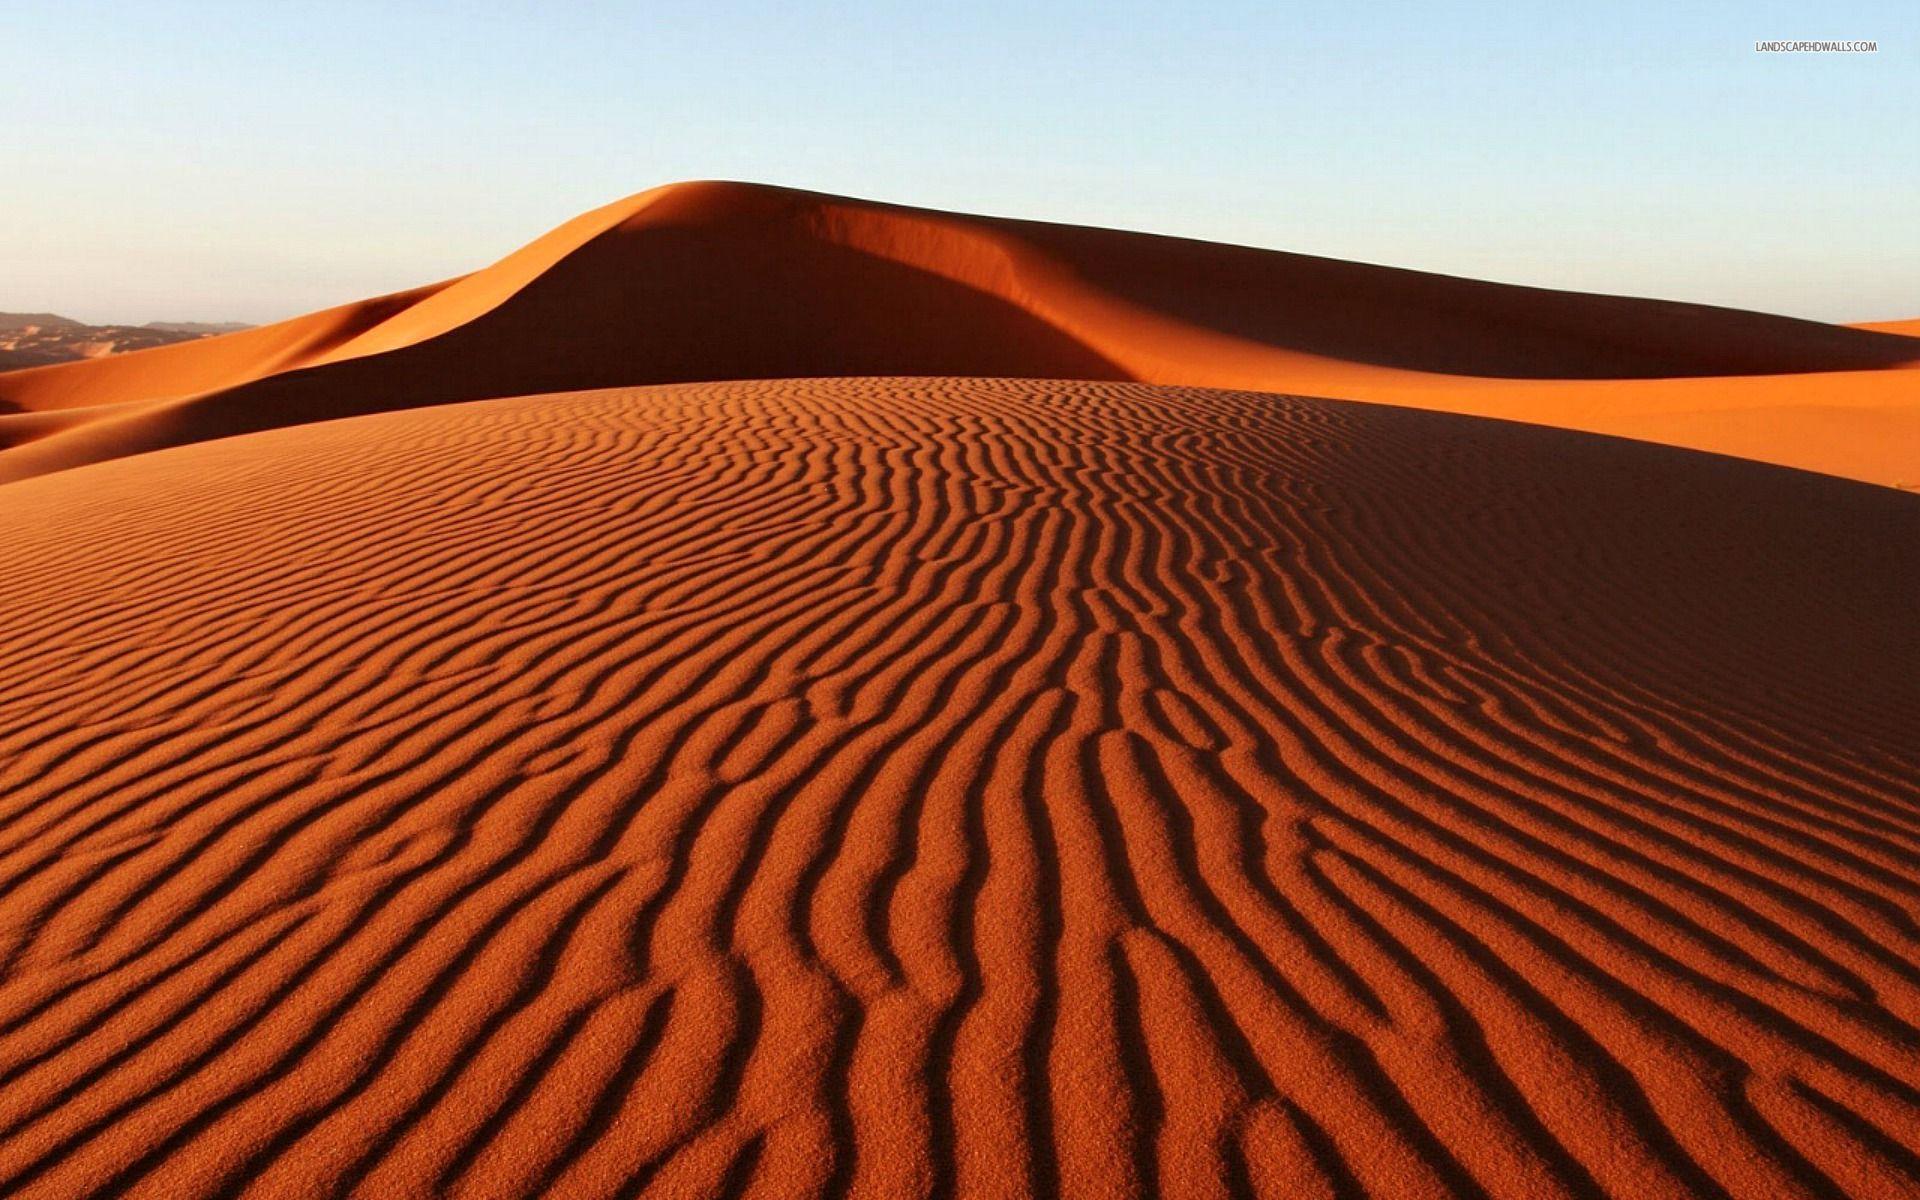 62+ Sand Dunes Wallpaper on WallpaperSafari